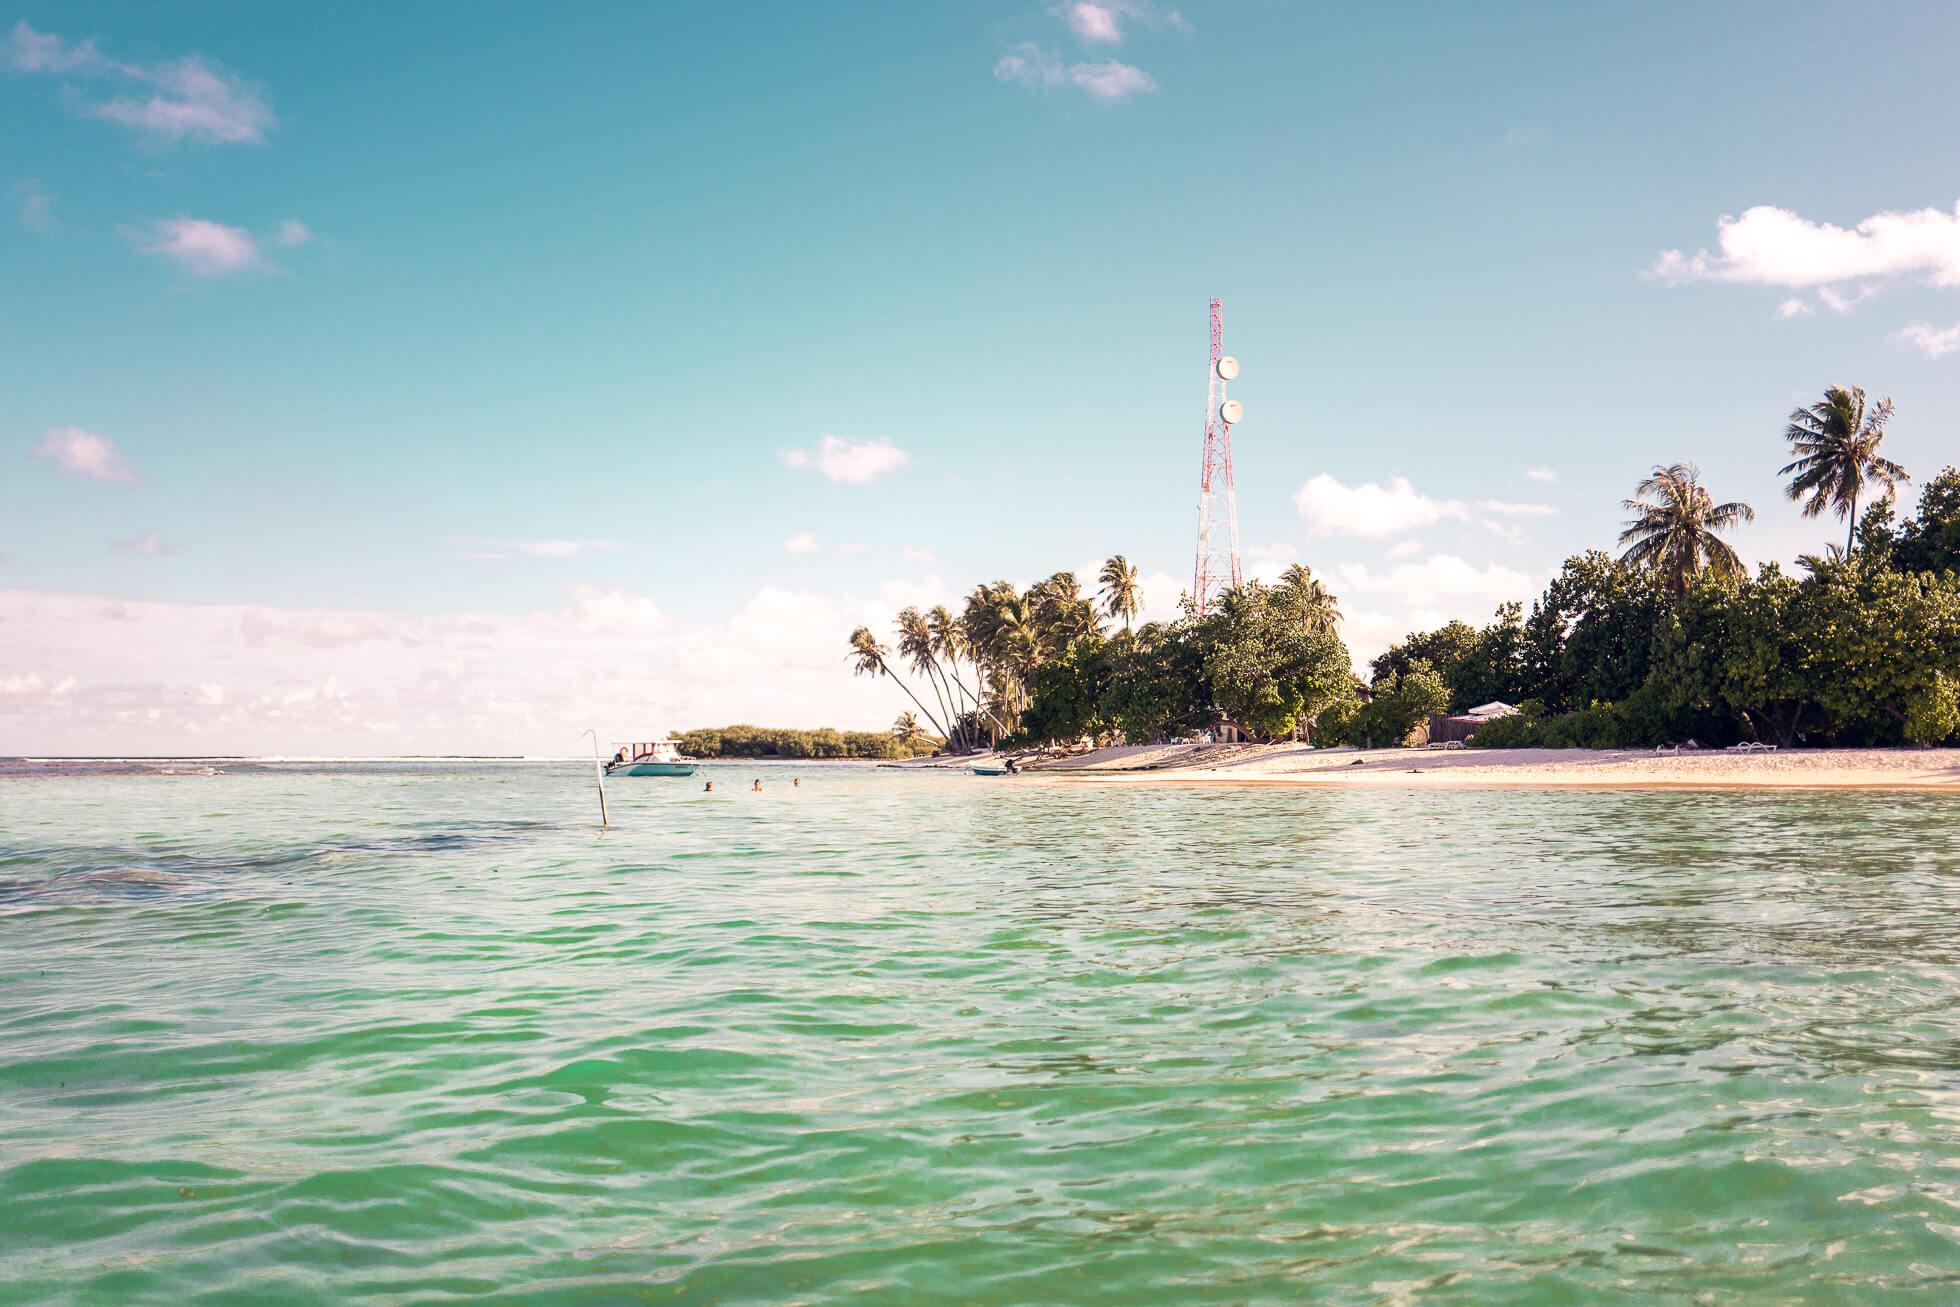 janni-deler-paradise-islandl1110944